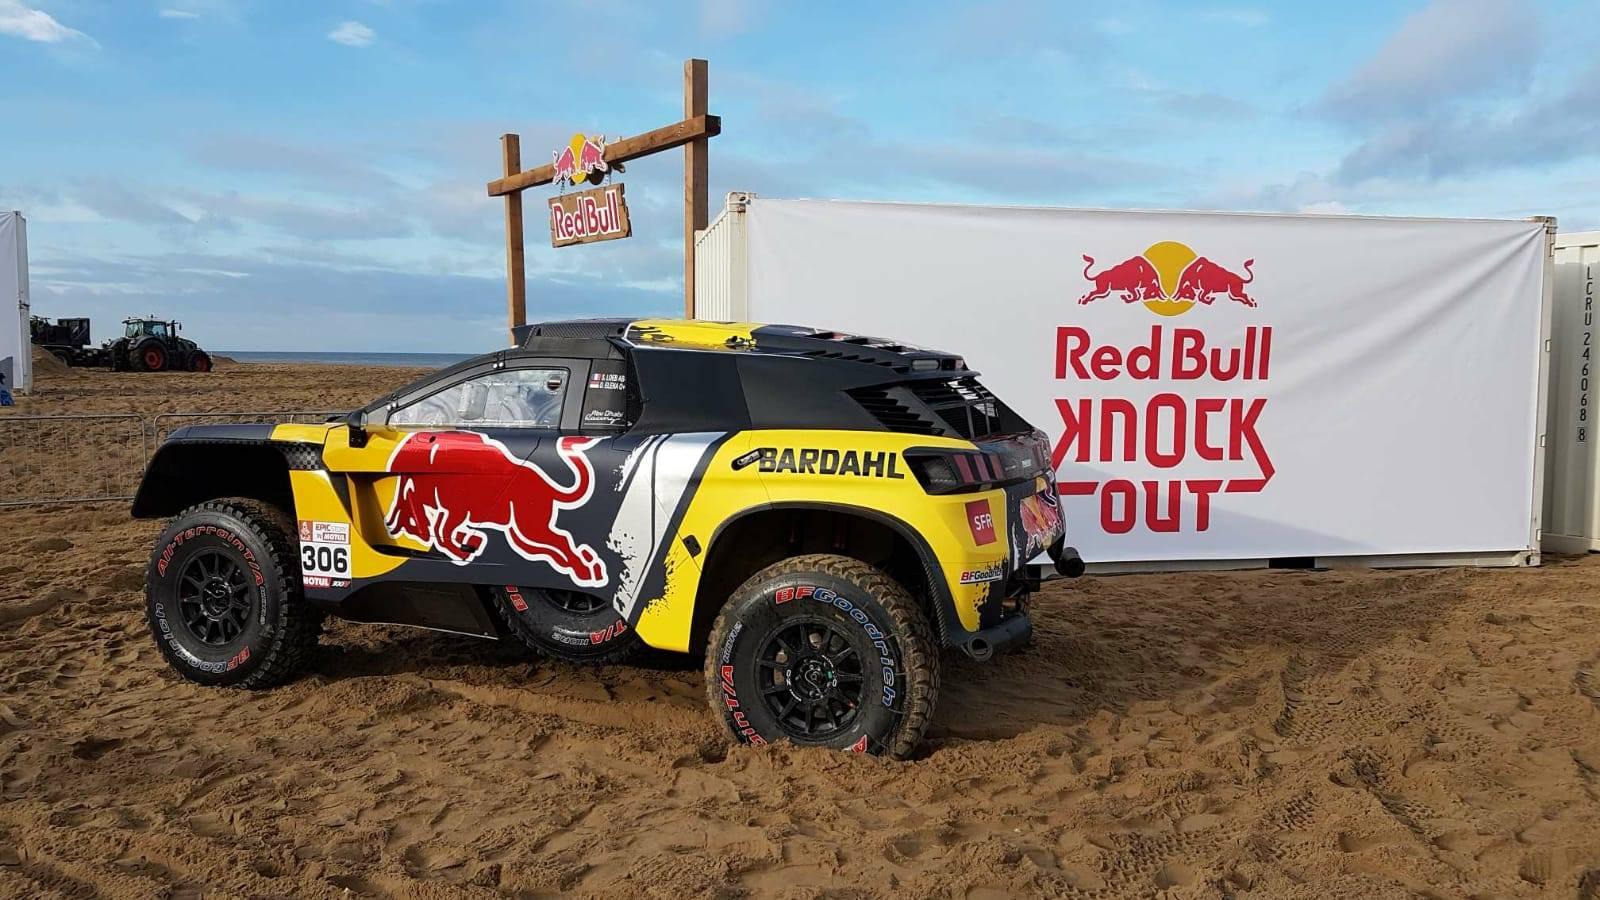 2017 Rallye Raid Dakar Paraguay - Bolivia - Argentina [2-14 Enero] - Página 38 DruG8qsWkAAk4o2